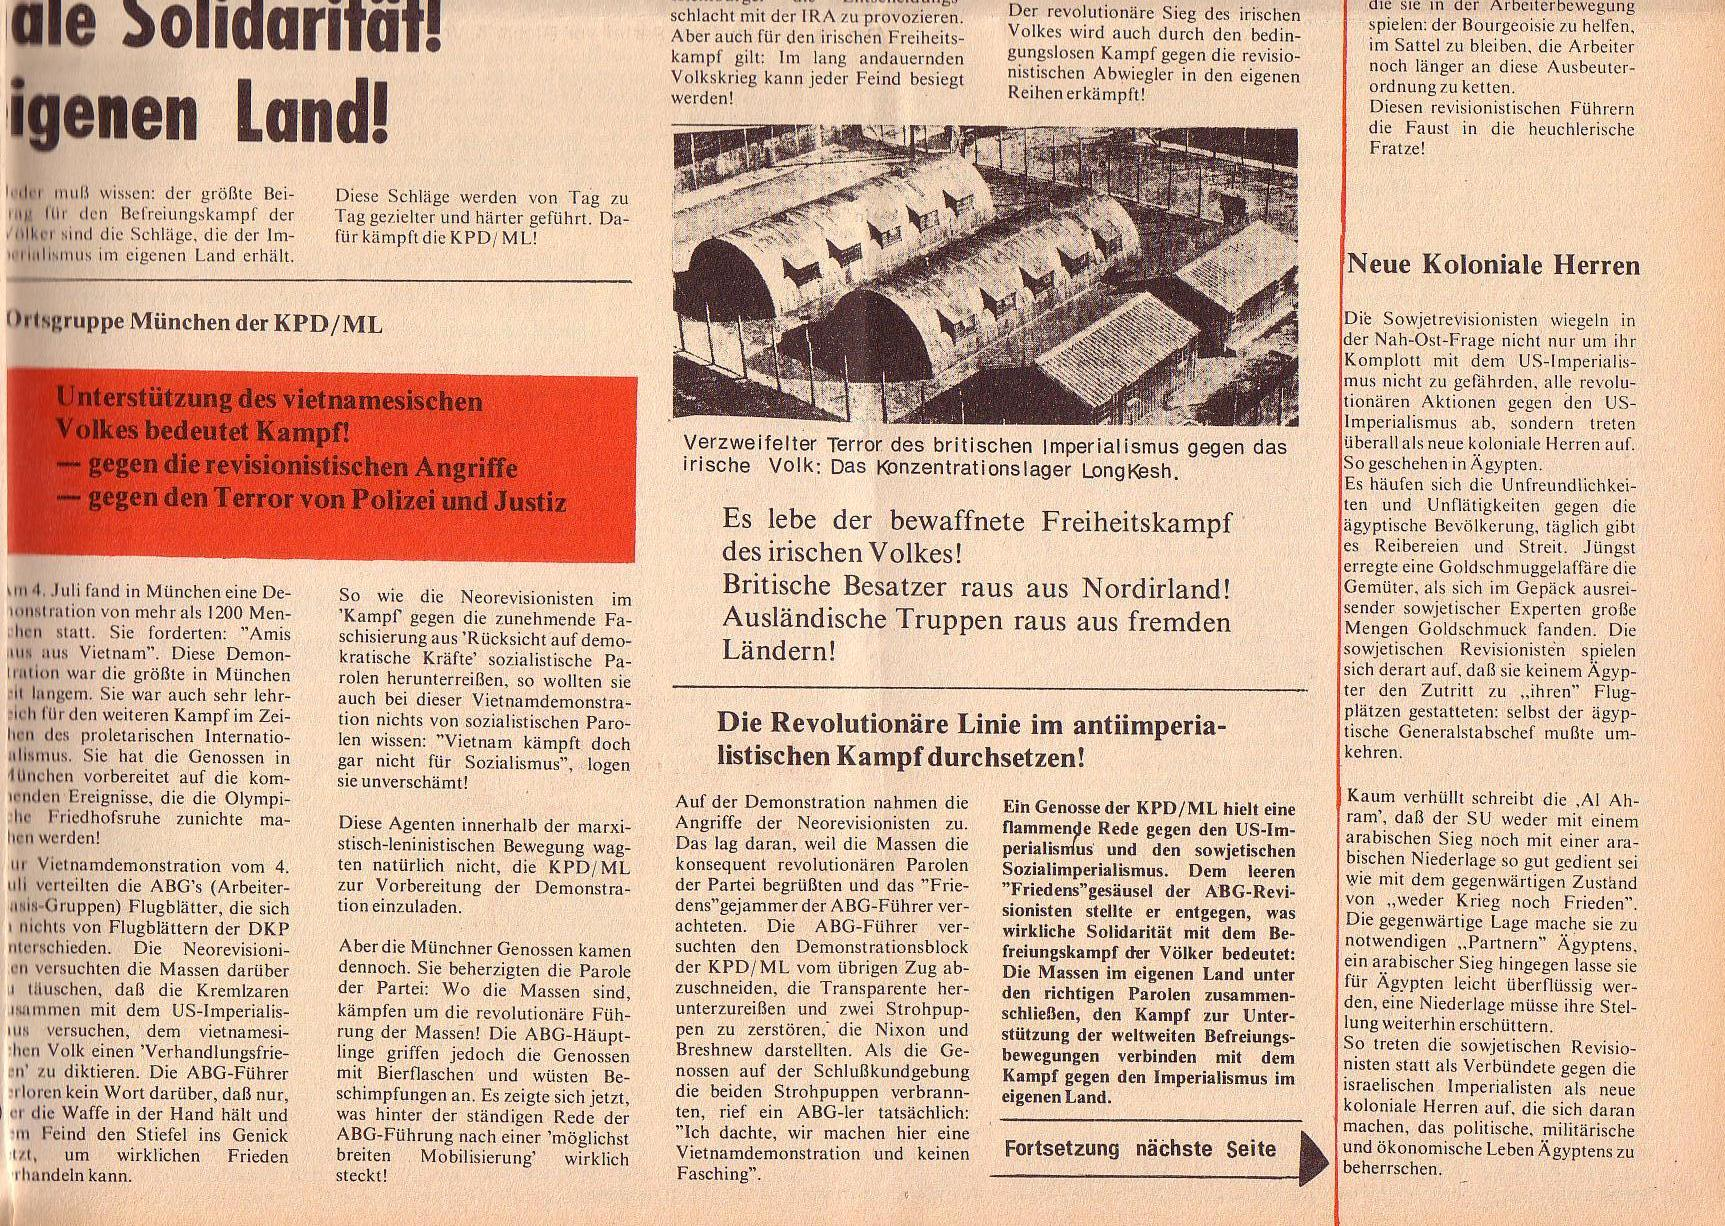 Roter Morgen, 6. Jg., 31. Juli 1972, Nr. 15, Seite 7b